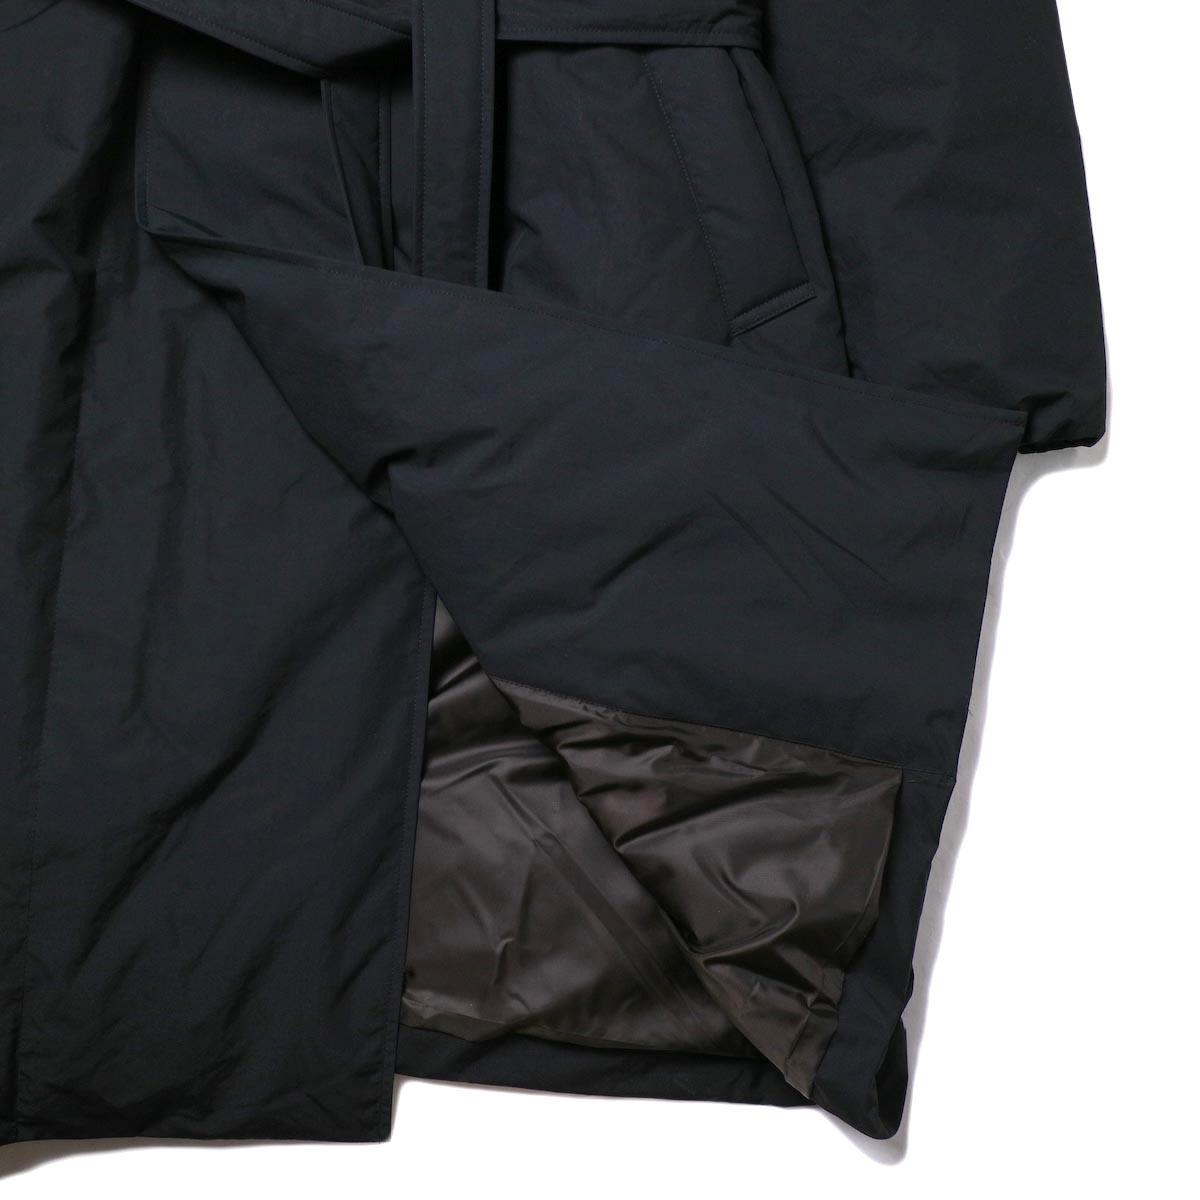 THE LOFT LABO / NARDY (Black) 裾・裏地